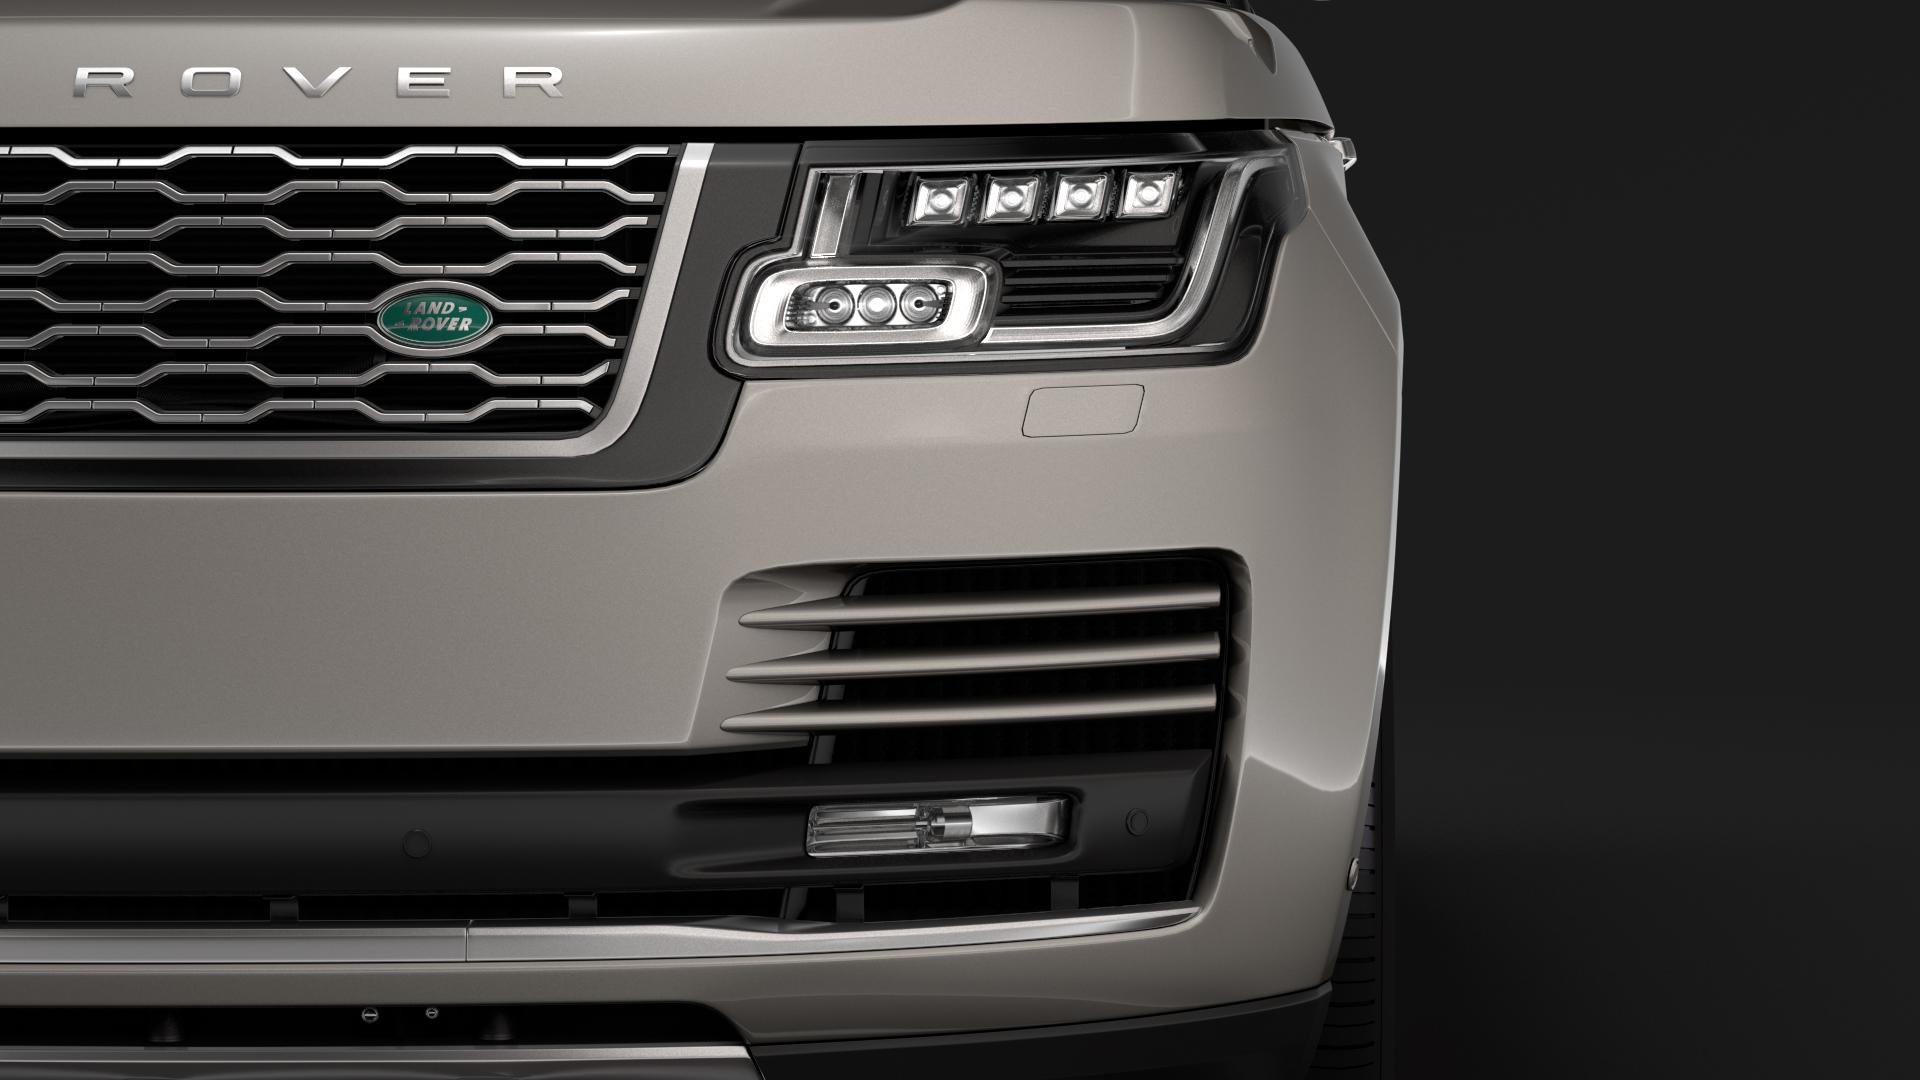 range rover hybrid lwb l405 2018 3d model max fbx c4d lwo ma mb hrc xsi obj 277416